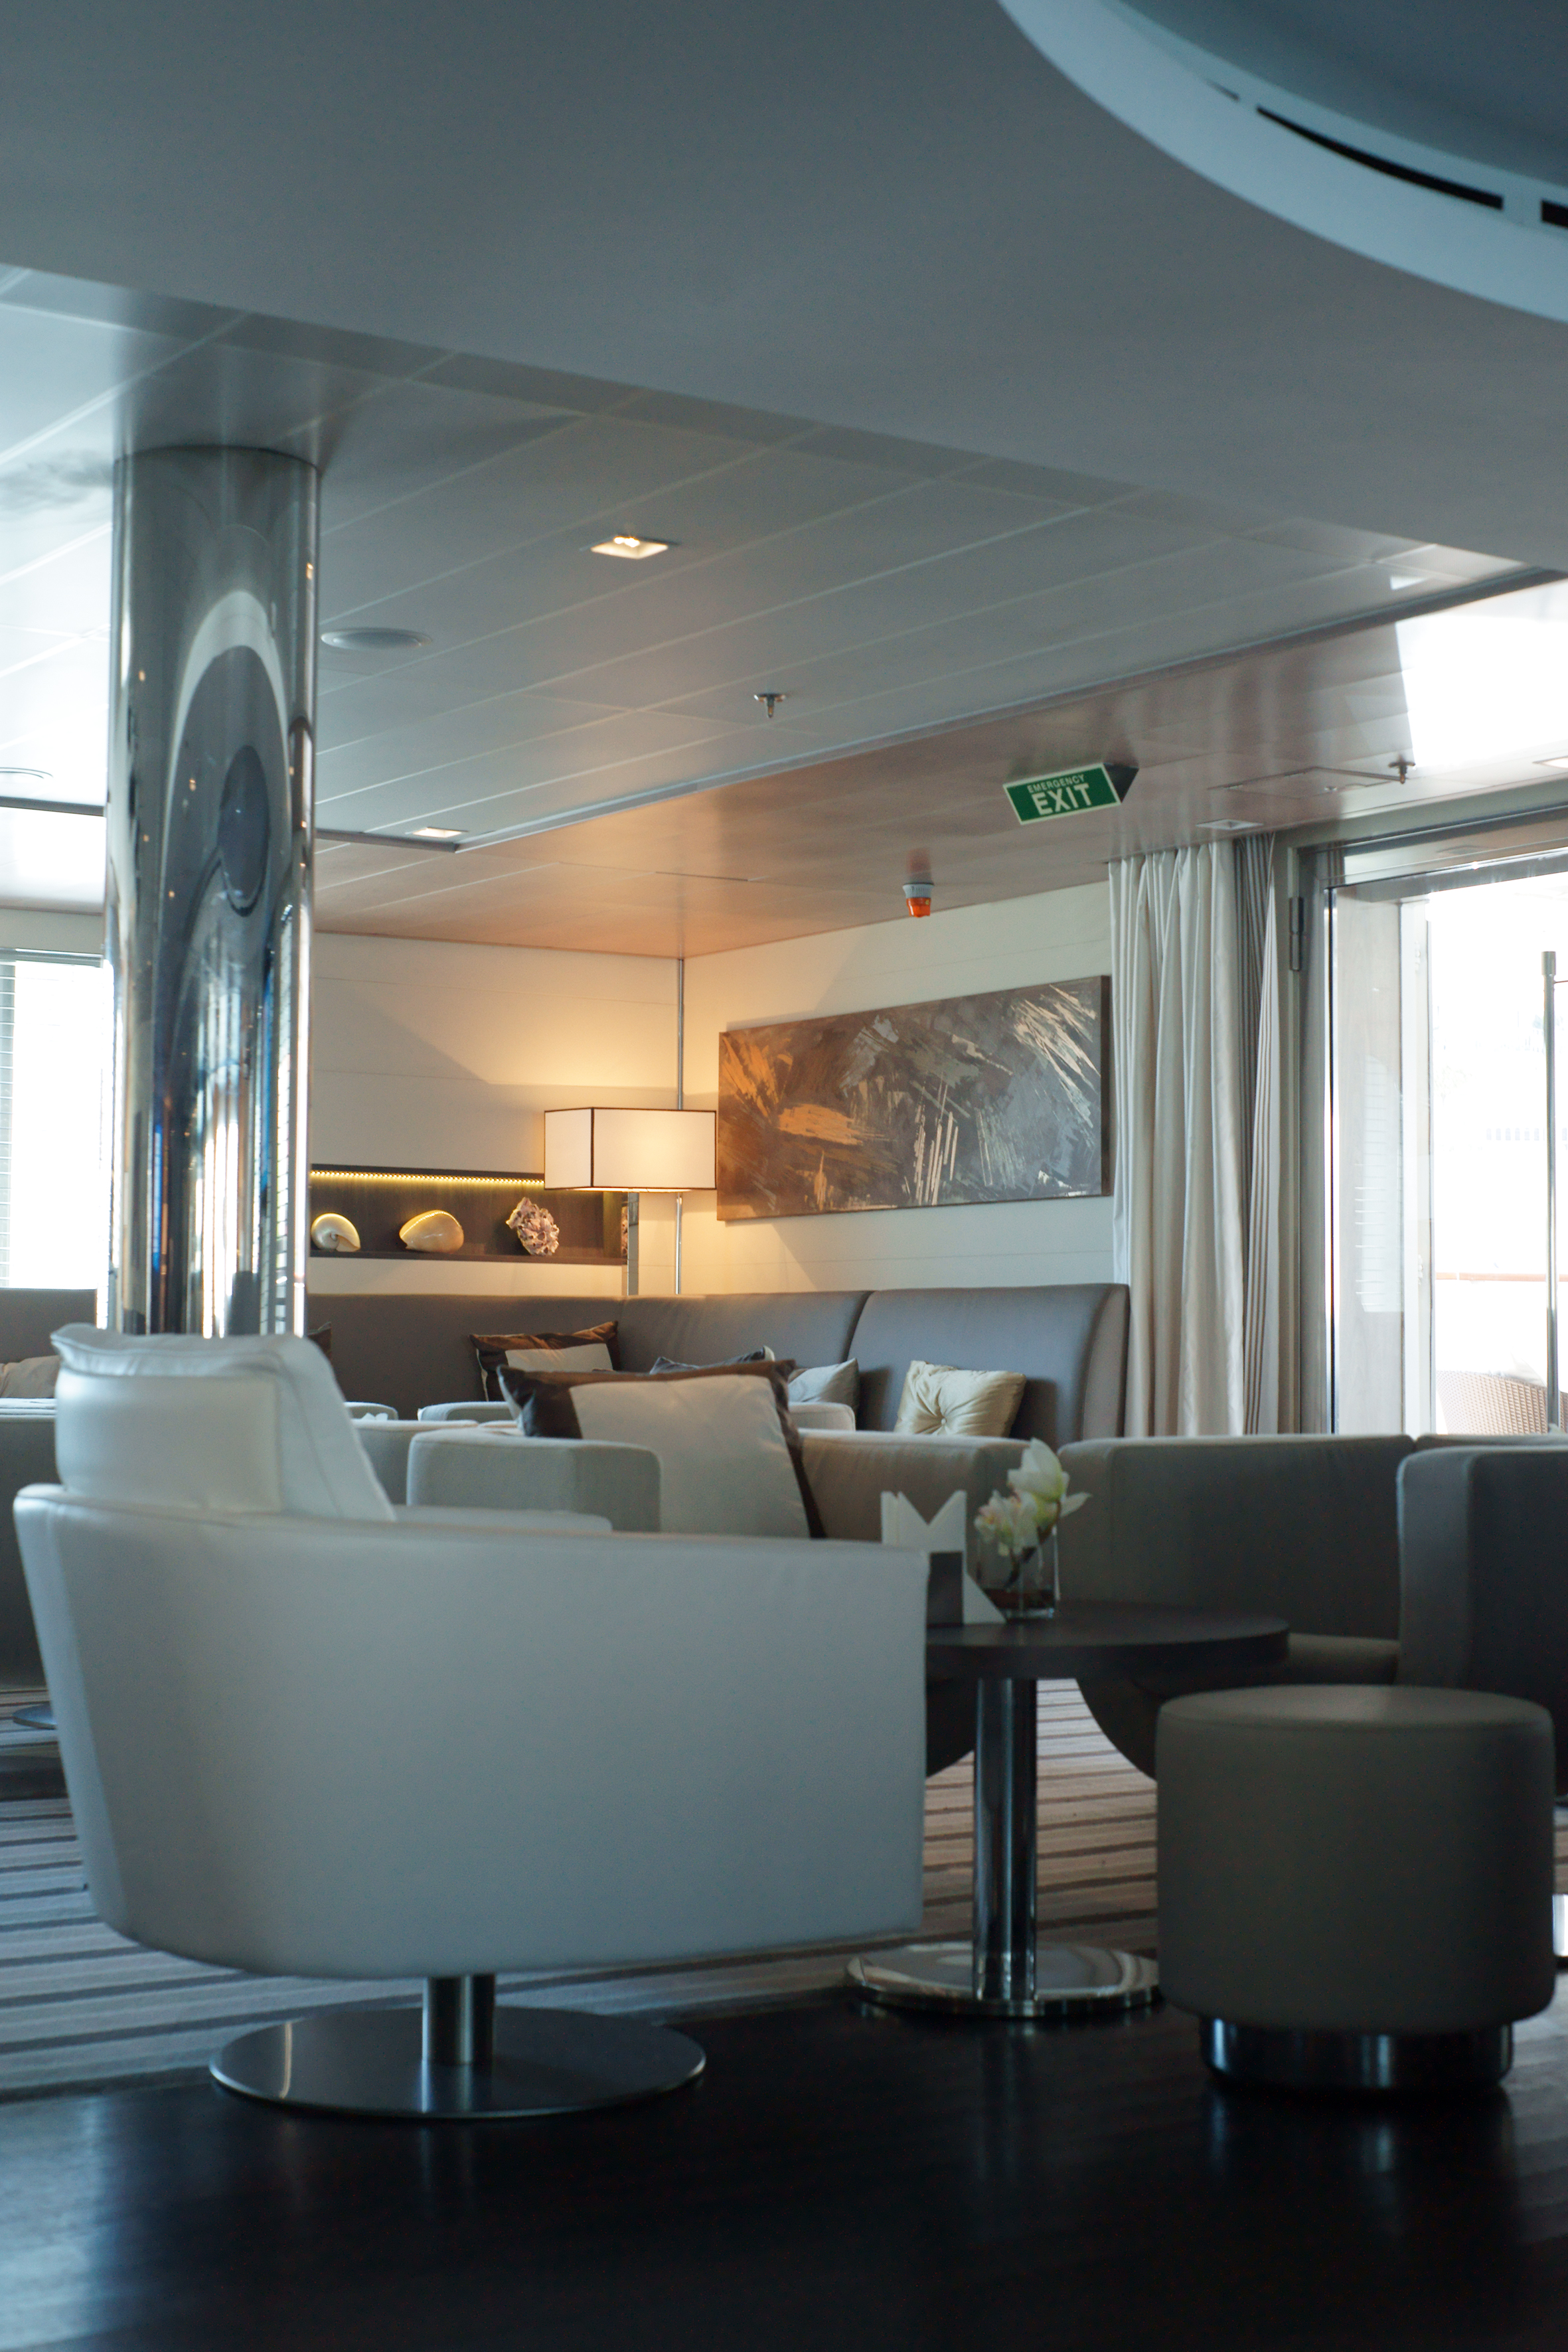 Ponant Le Boreal Interior Main Lounge 6.JPEG